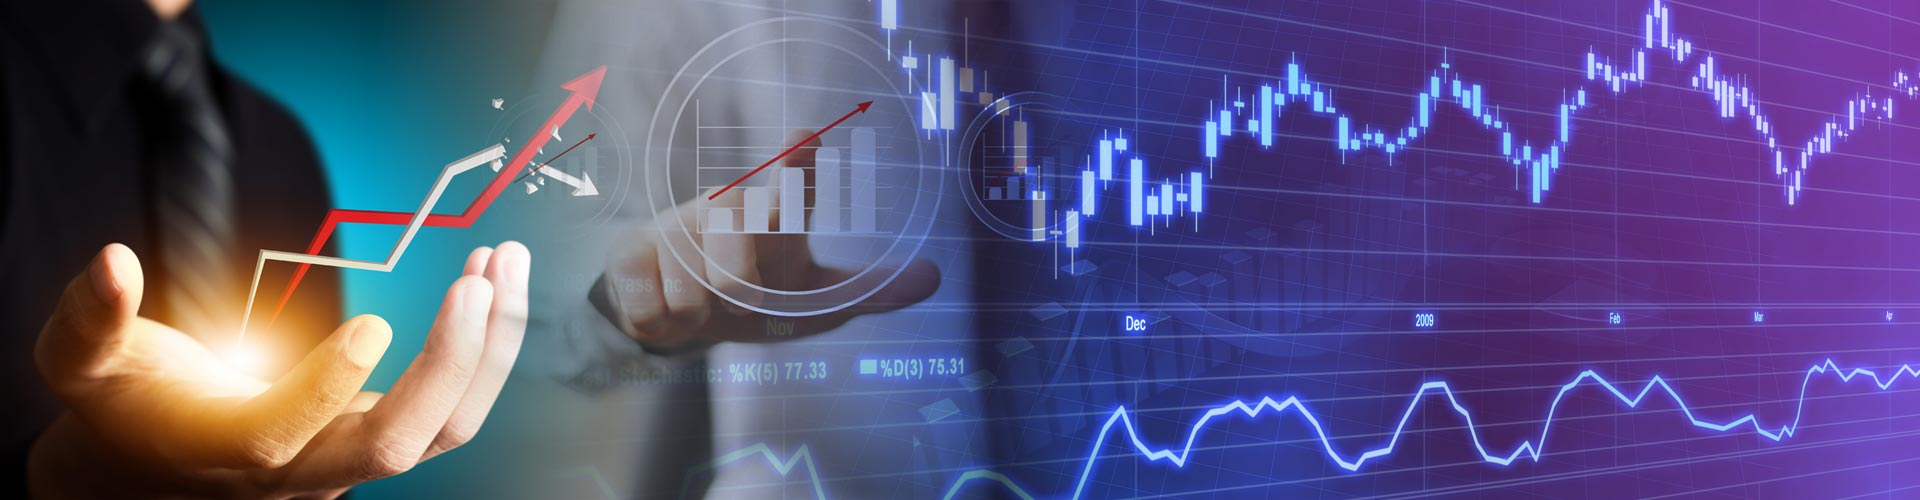 Stock market - NSE, BSE Analysis, stock tips India